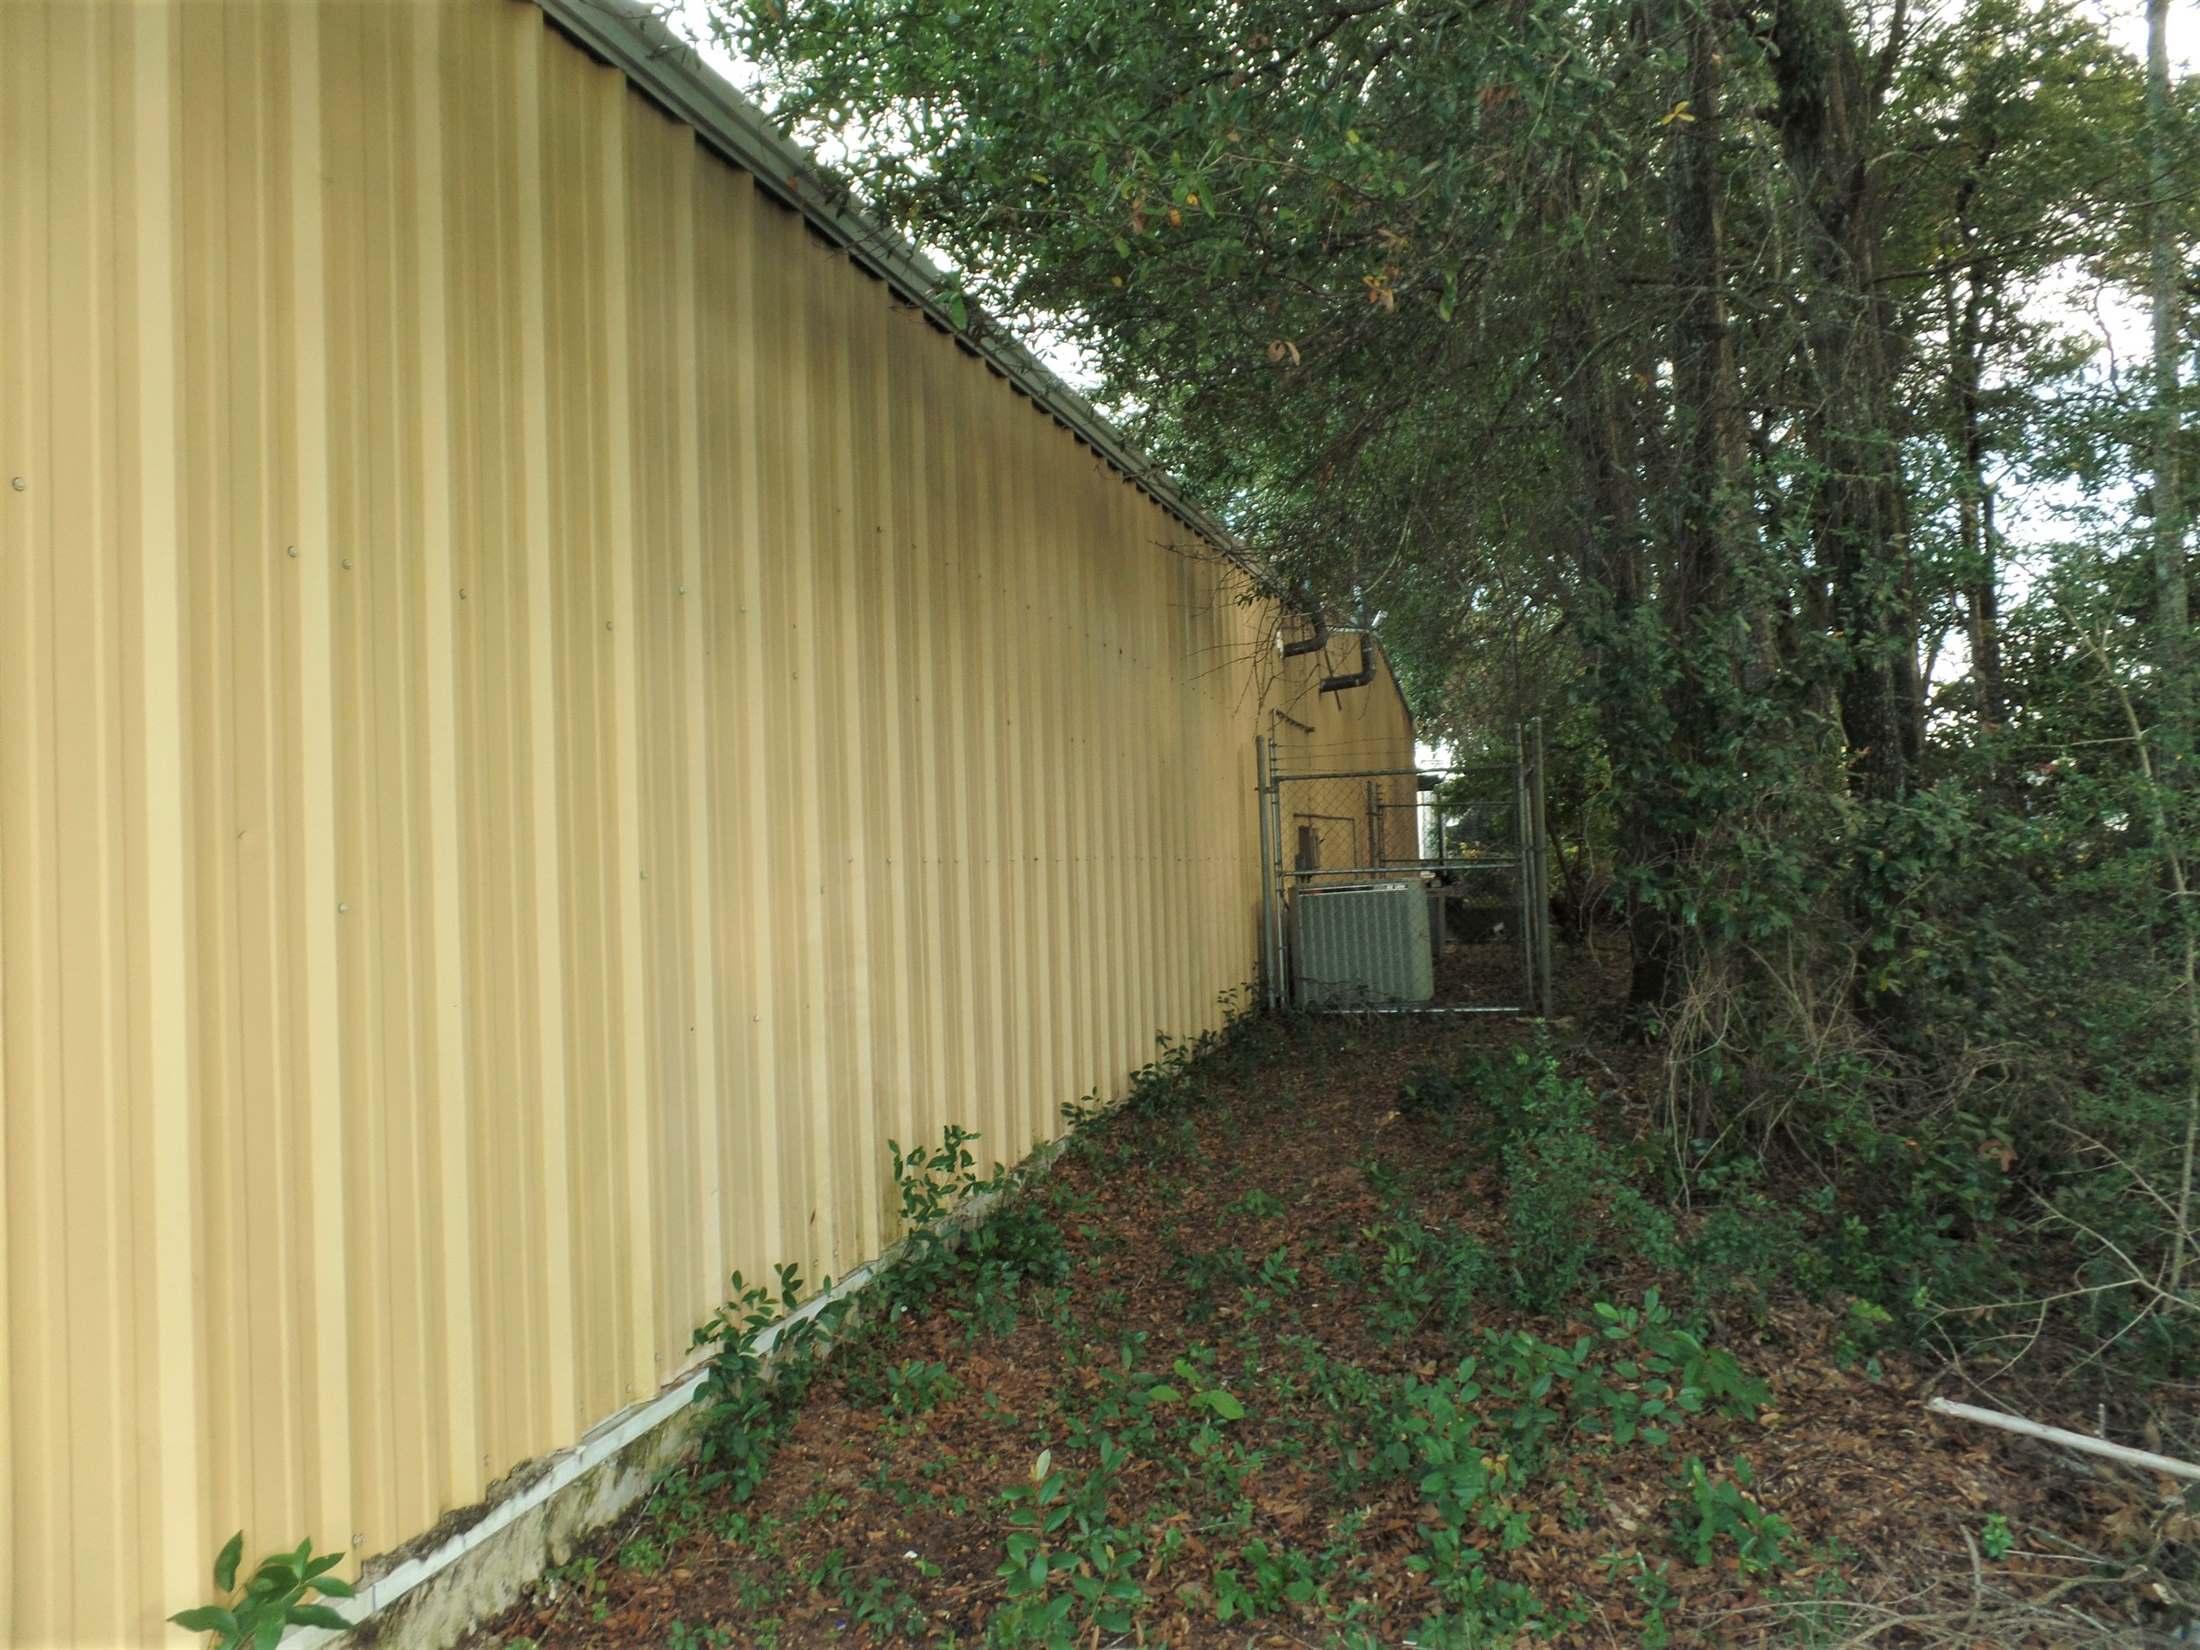 108 South Main Street, Crestview, FL 32536